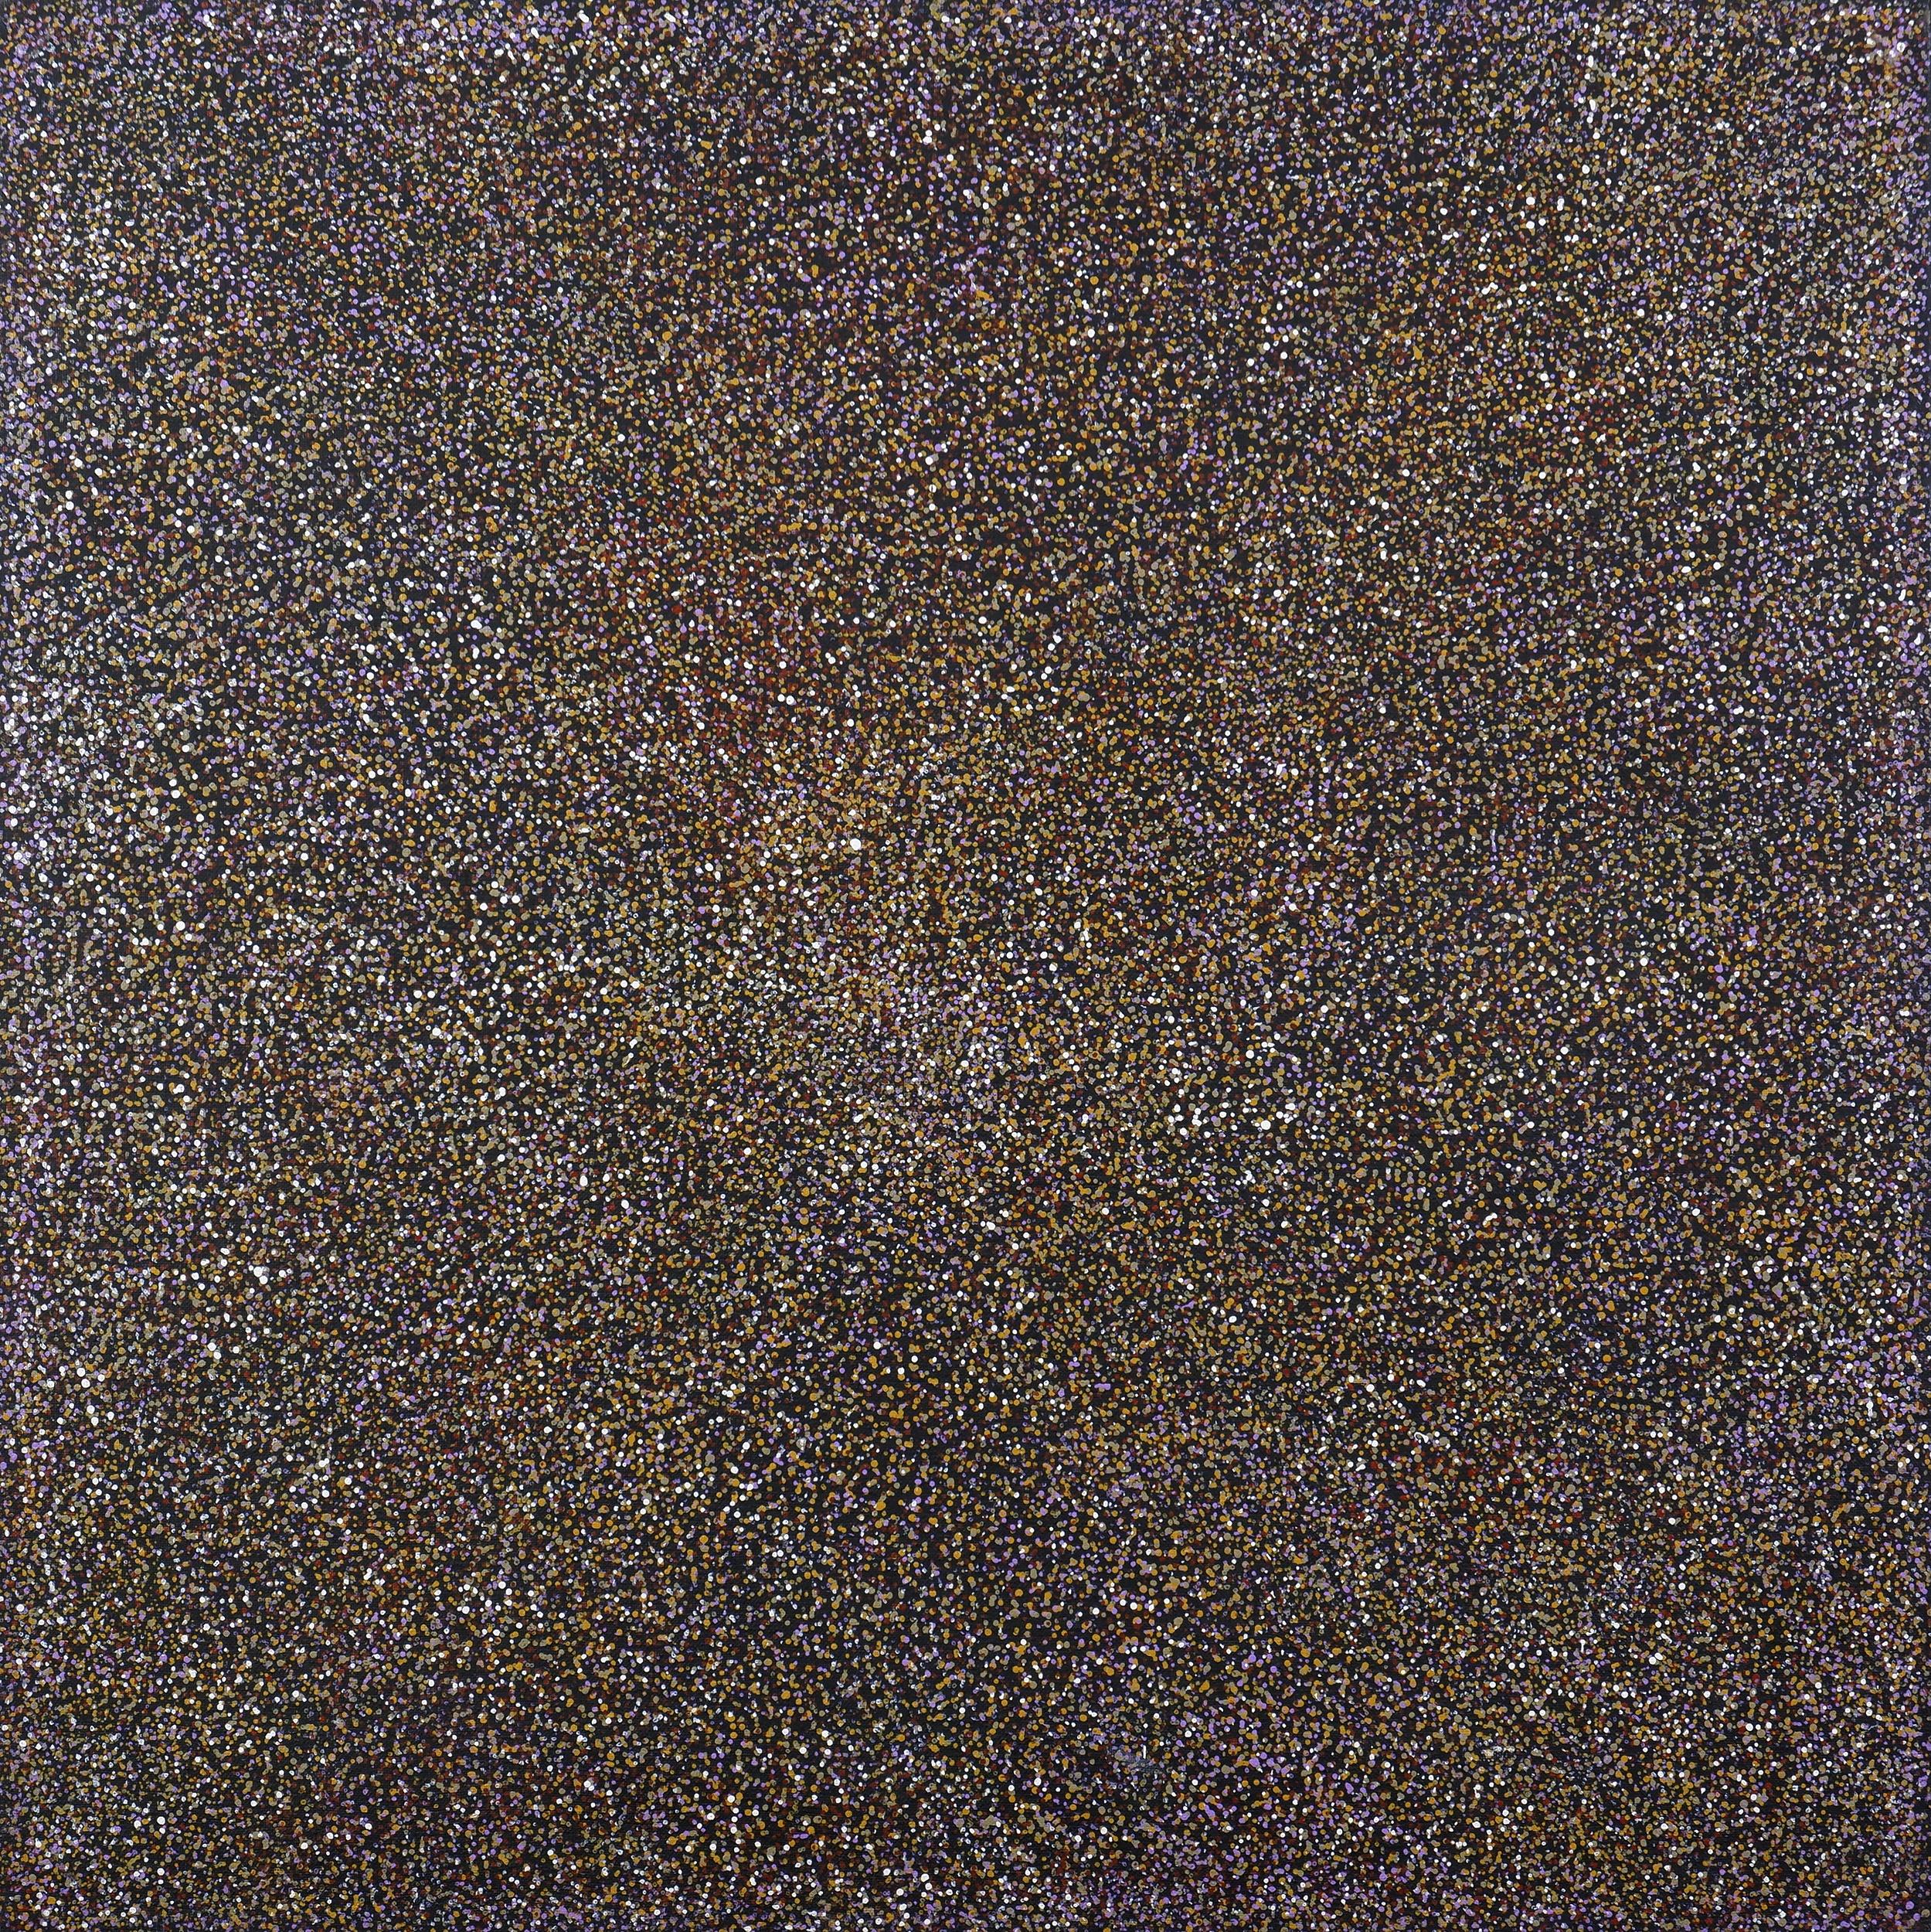 'Margaret Loy Pula (born 1956, Anmatyerre language group), Bush Potato, Acrylic on Canvas'